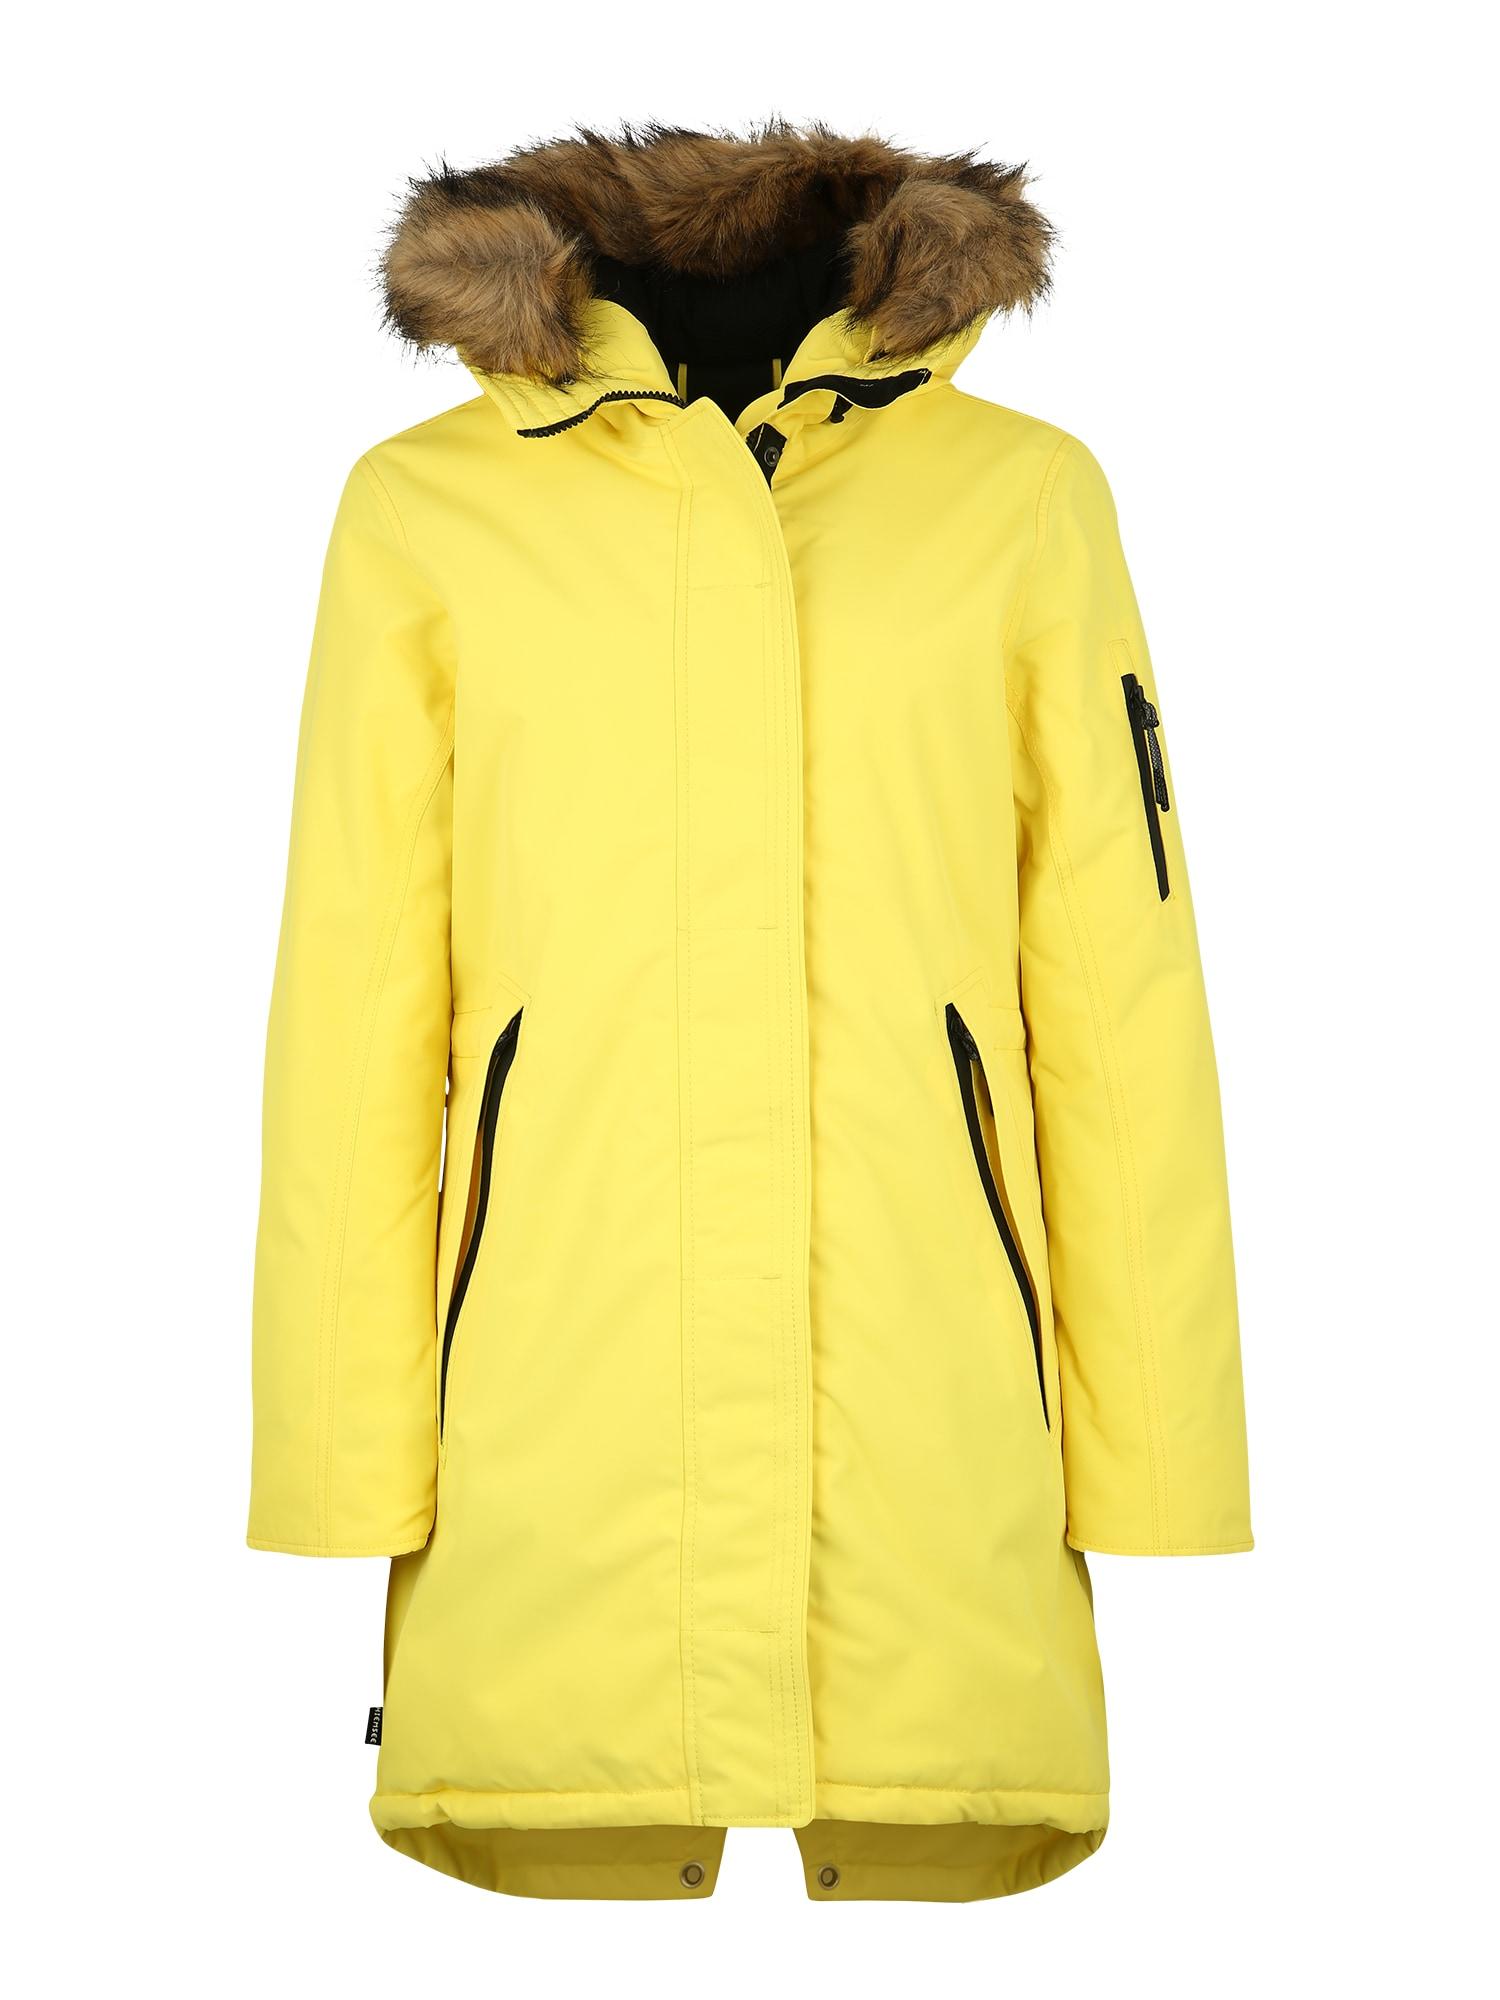 CHIEMSEE Outdoorová bunda  žlutá